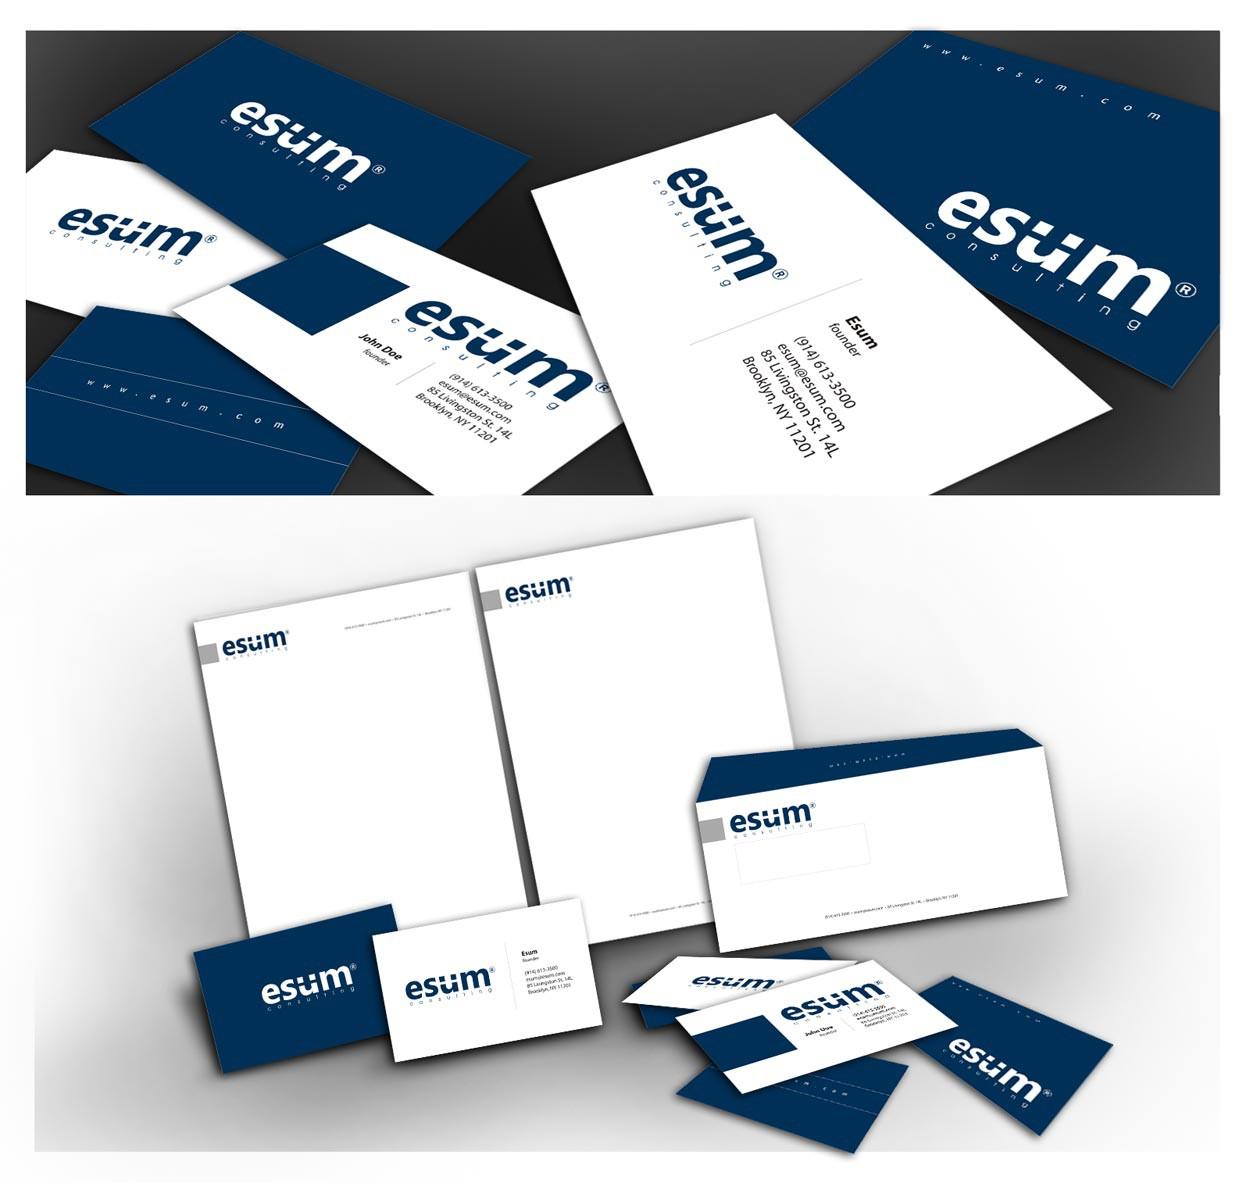 Create the next logo and stationary for Esum